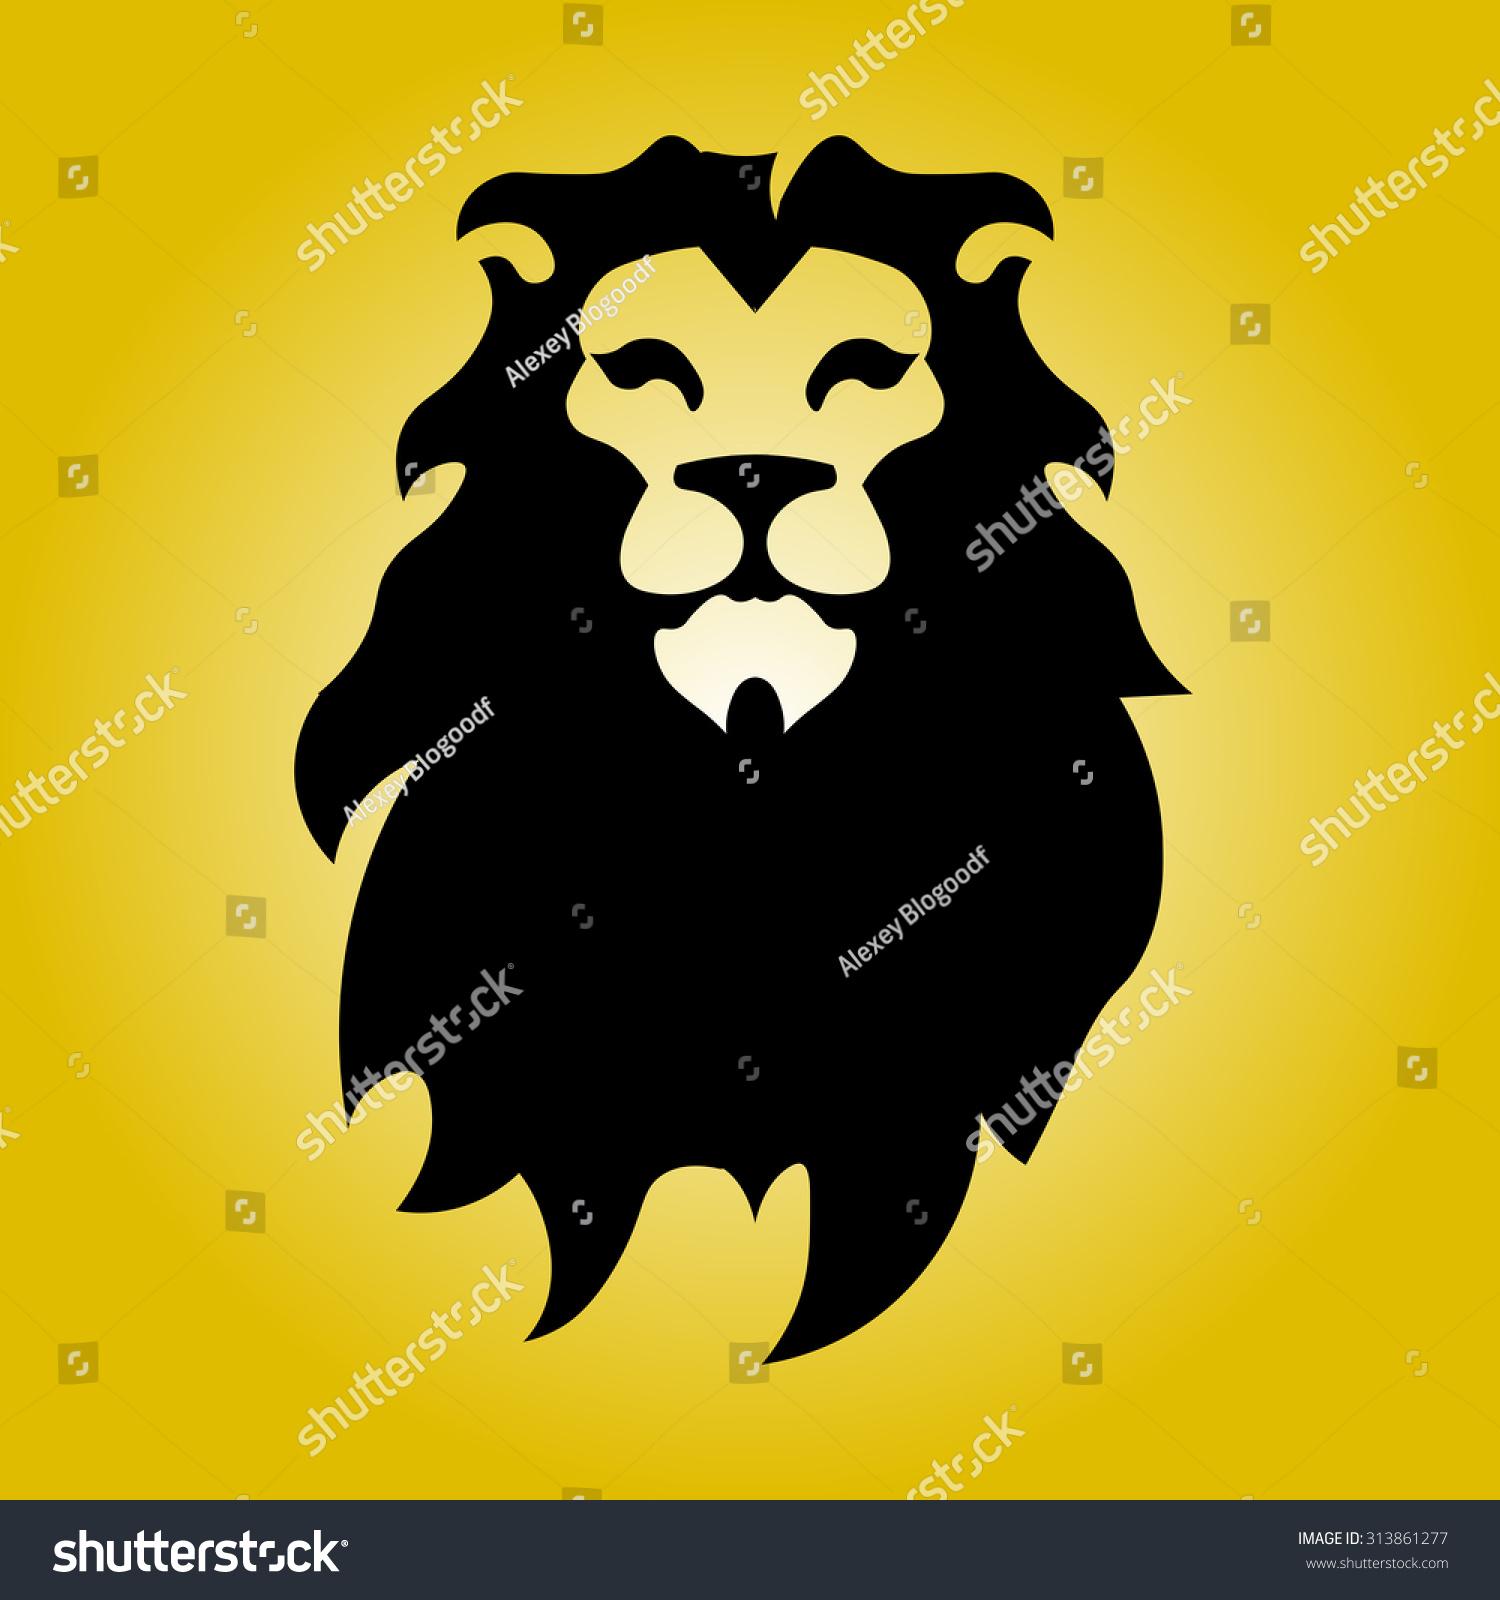 Hand Drawn Lion Head Images Stock Photos amp Vectors